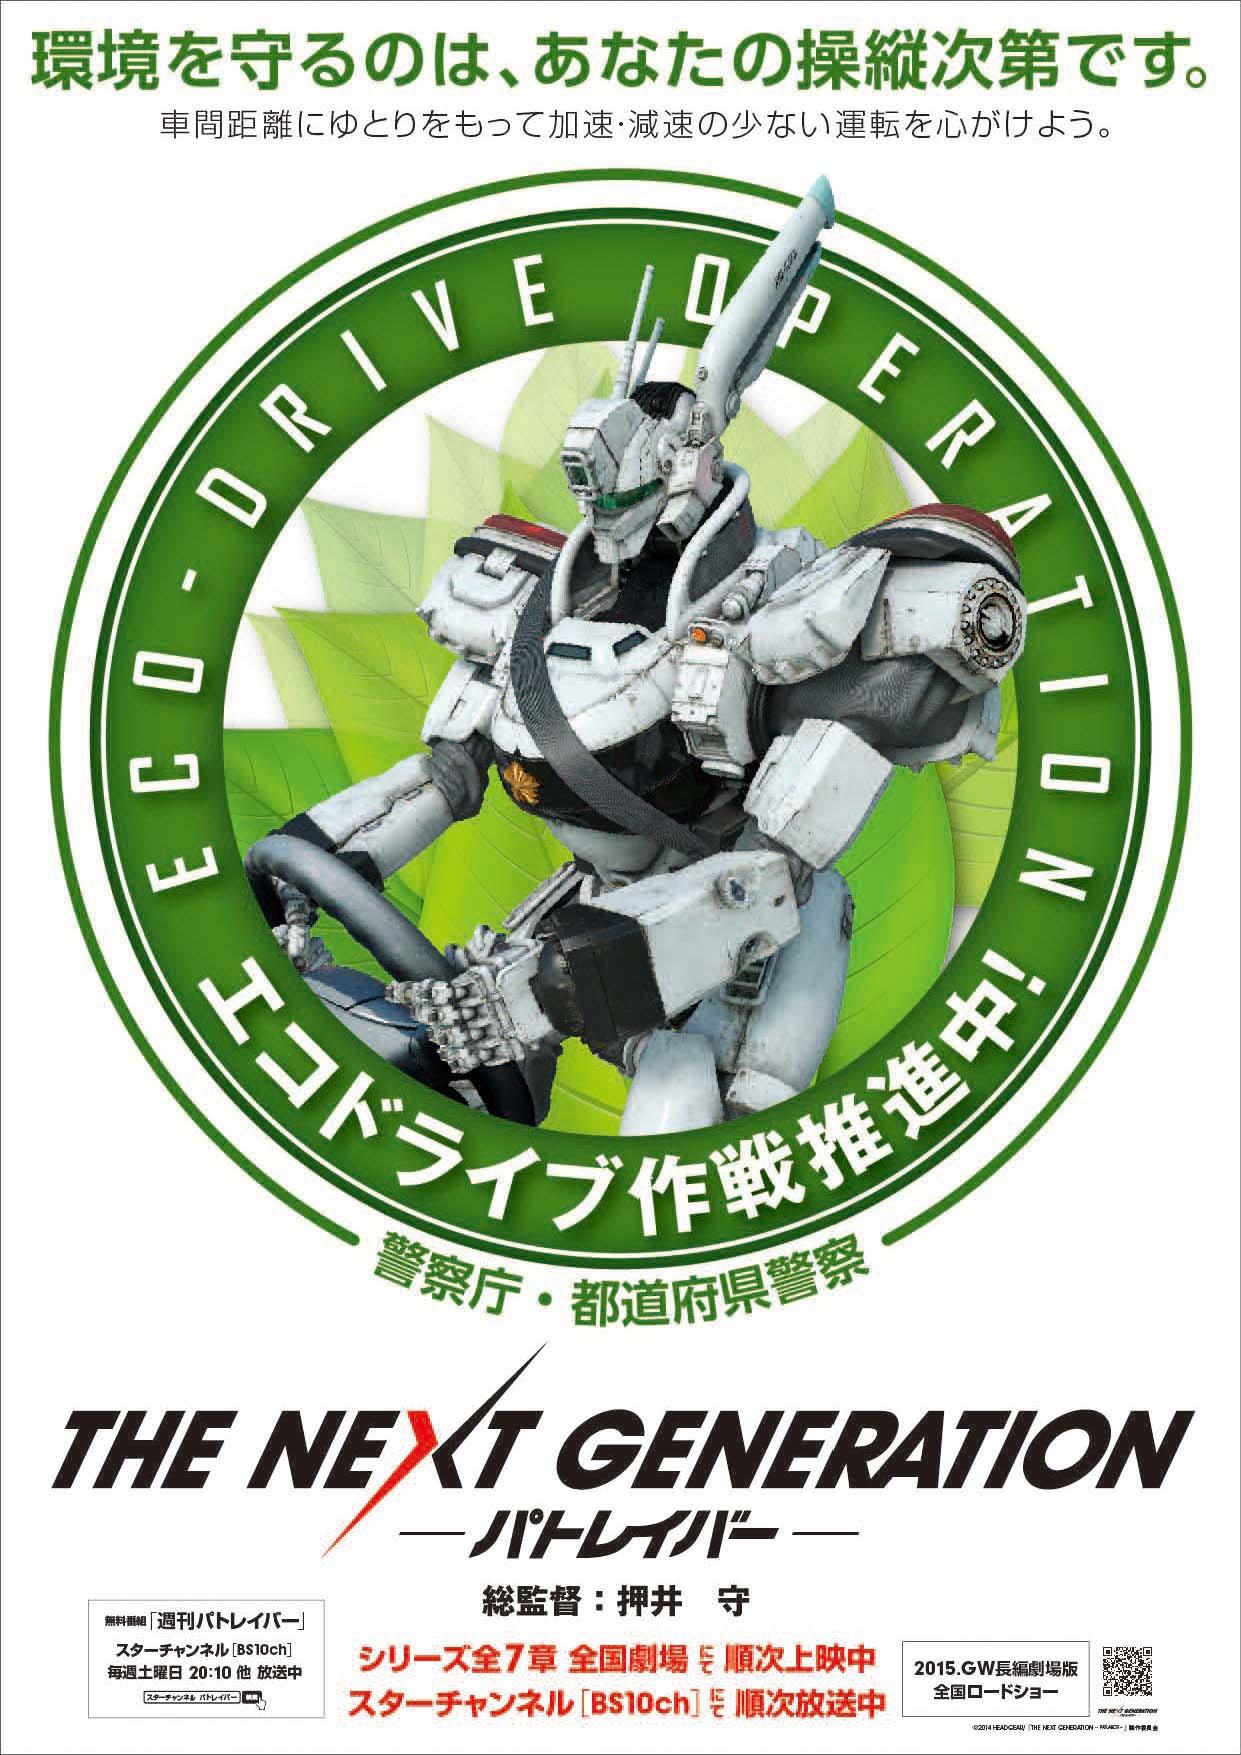 "『THE NEXT GENERATION パトレイバー』×警察庁 コラボレーション第6弾""エコドライブ作戦推進""ポスターを全国展開!"